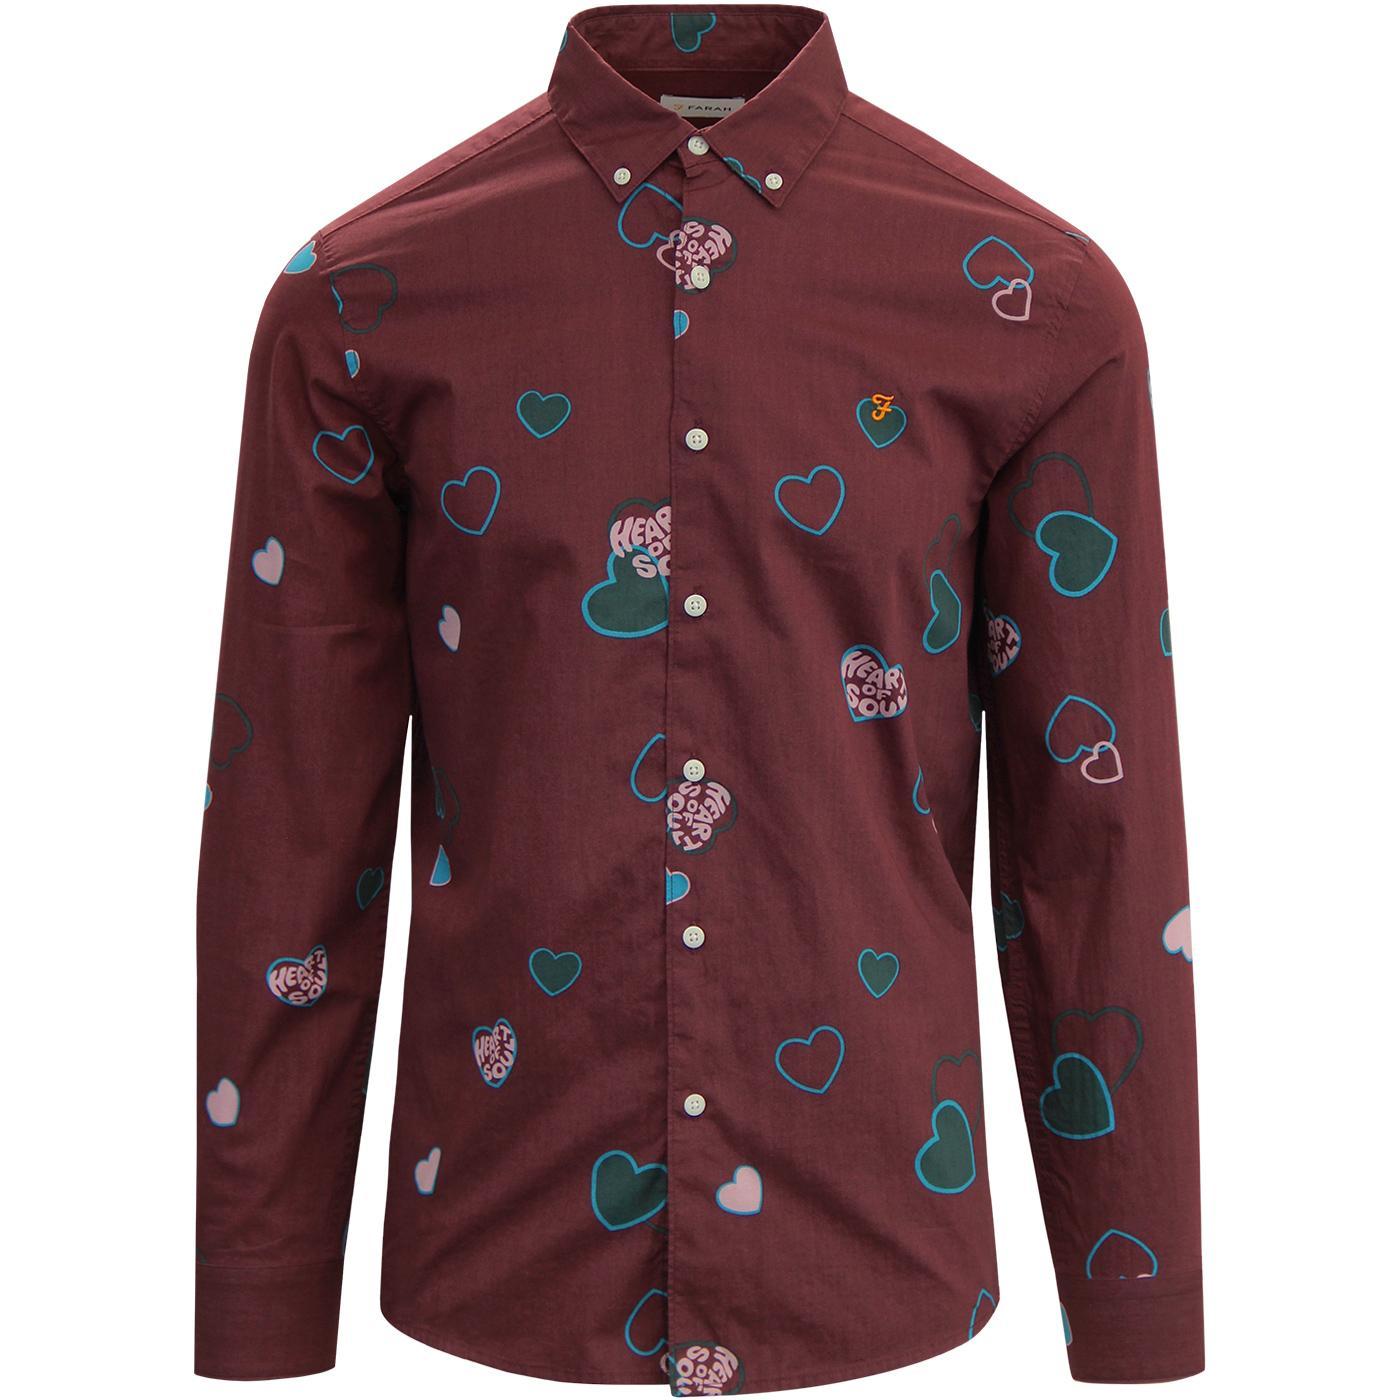 Darrell FARAH Heart Of Soul Northern Soul Shirt FR